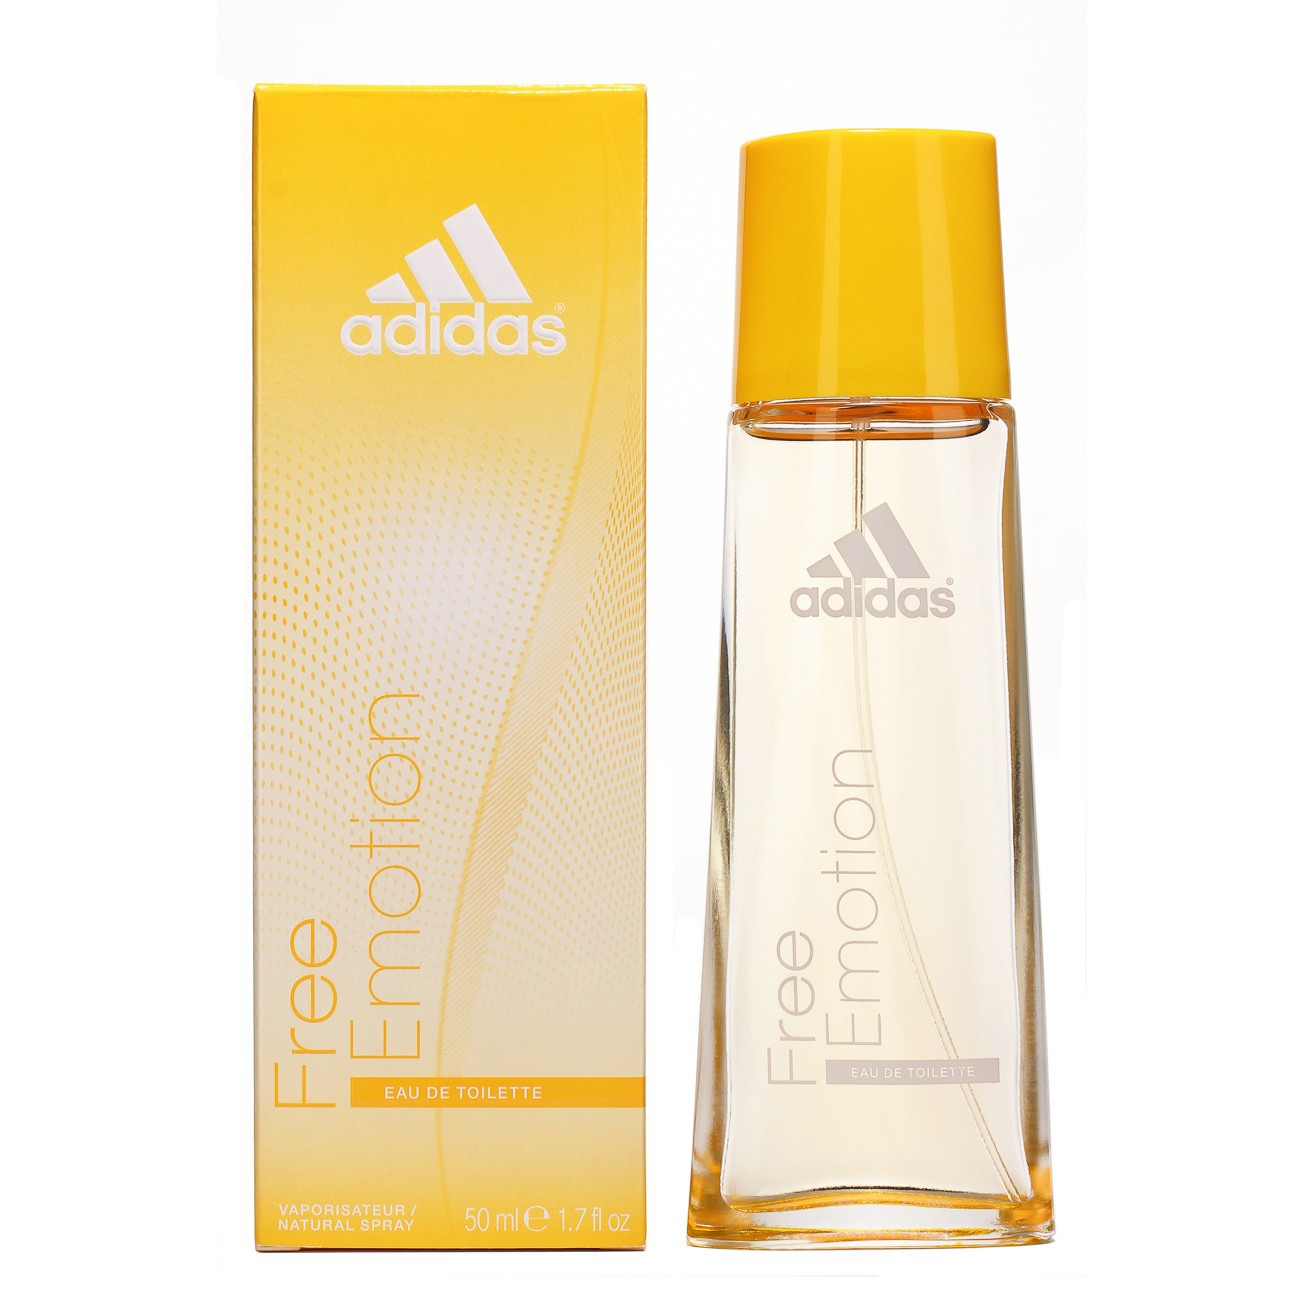 Adidas Free Emotion аромат для женщин